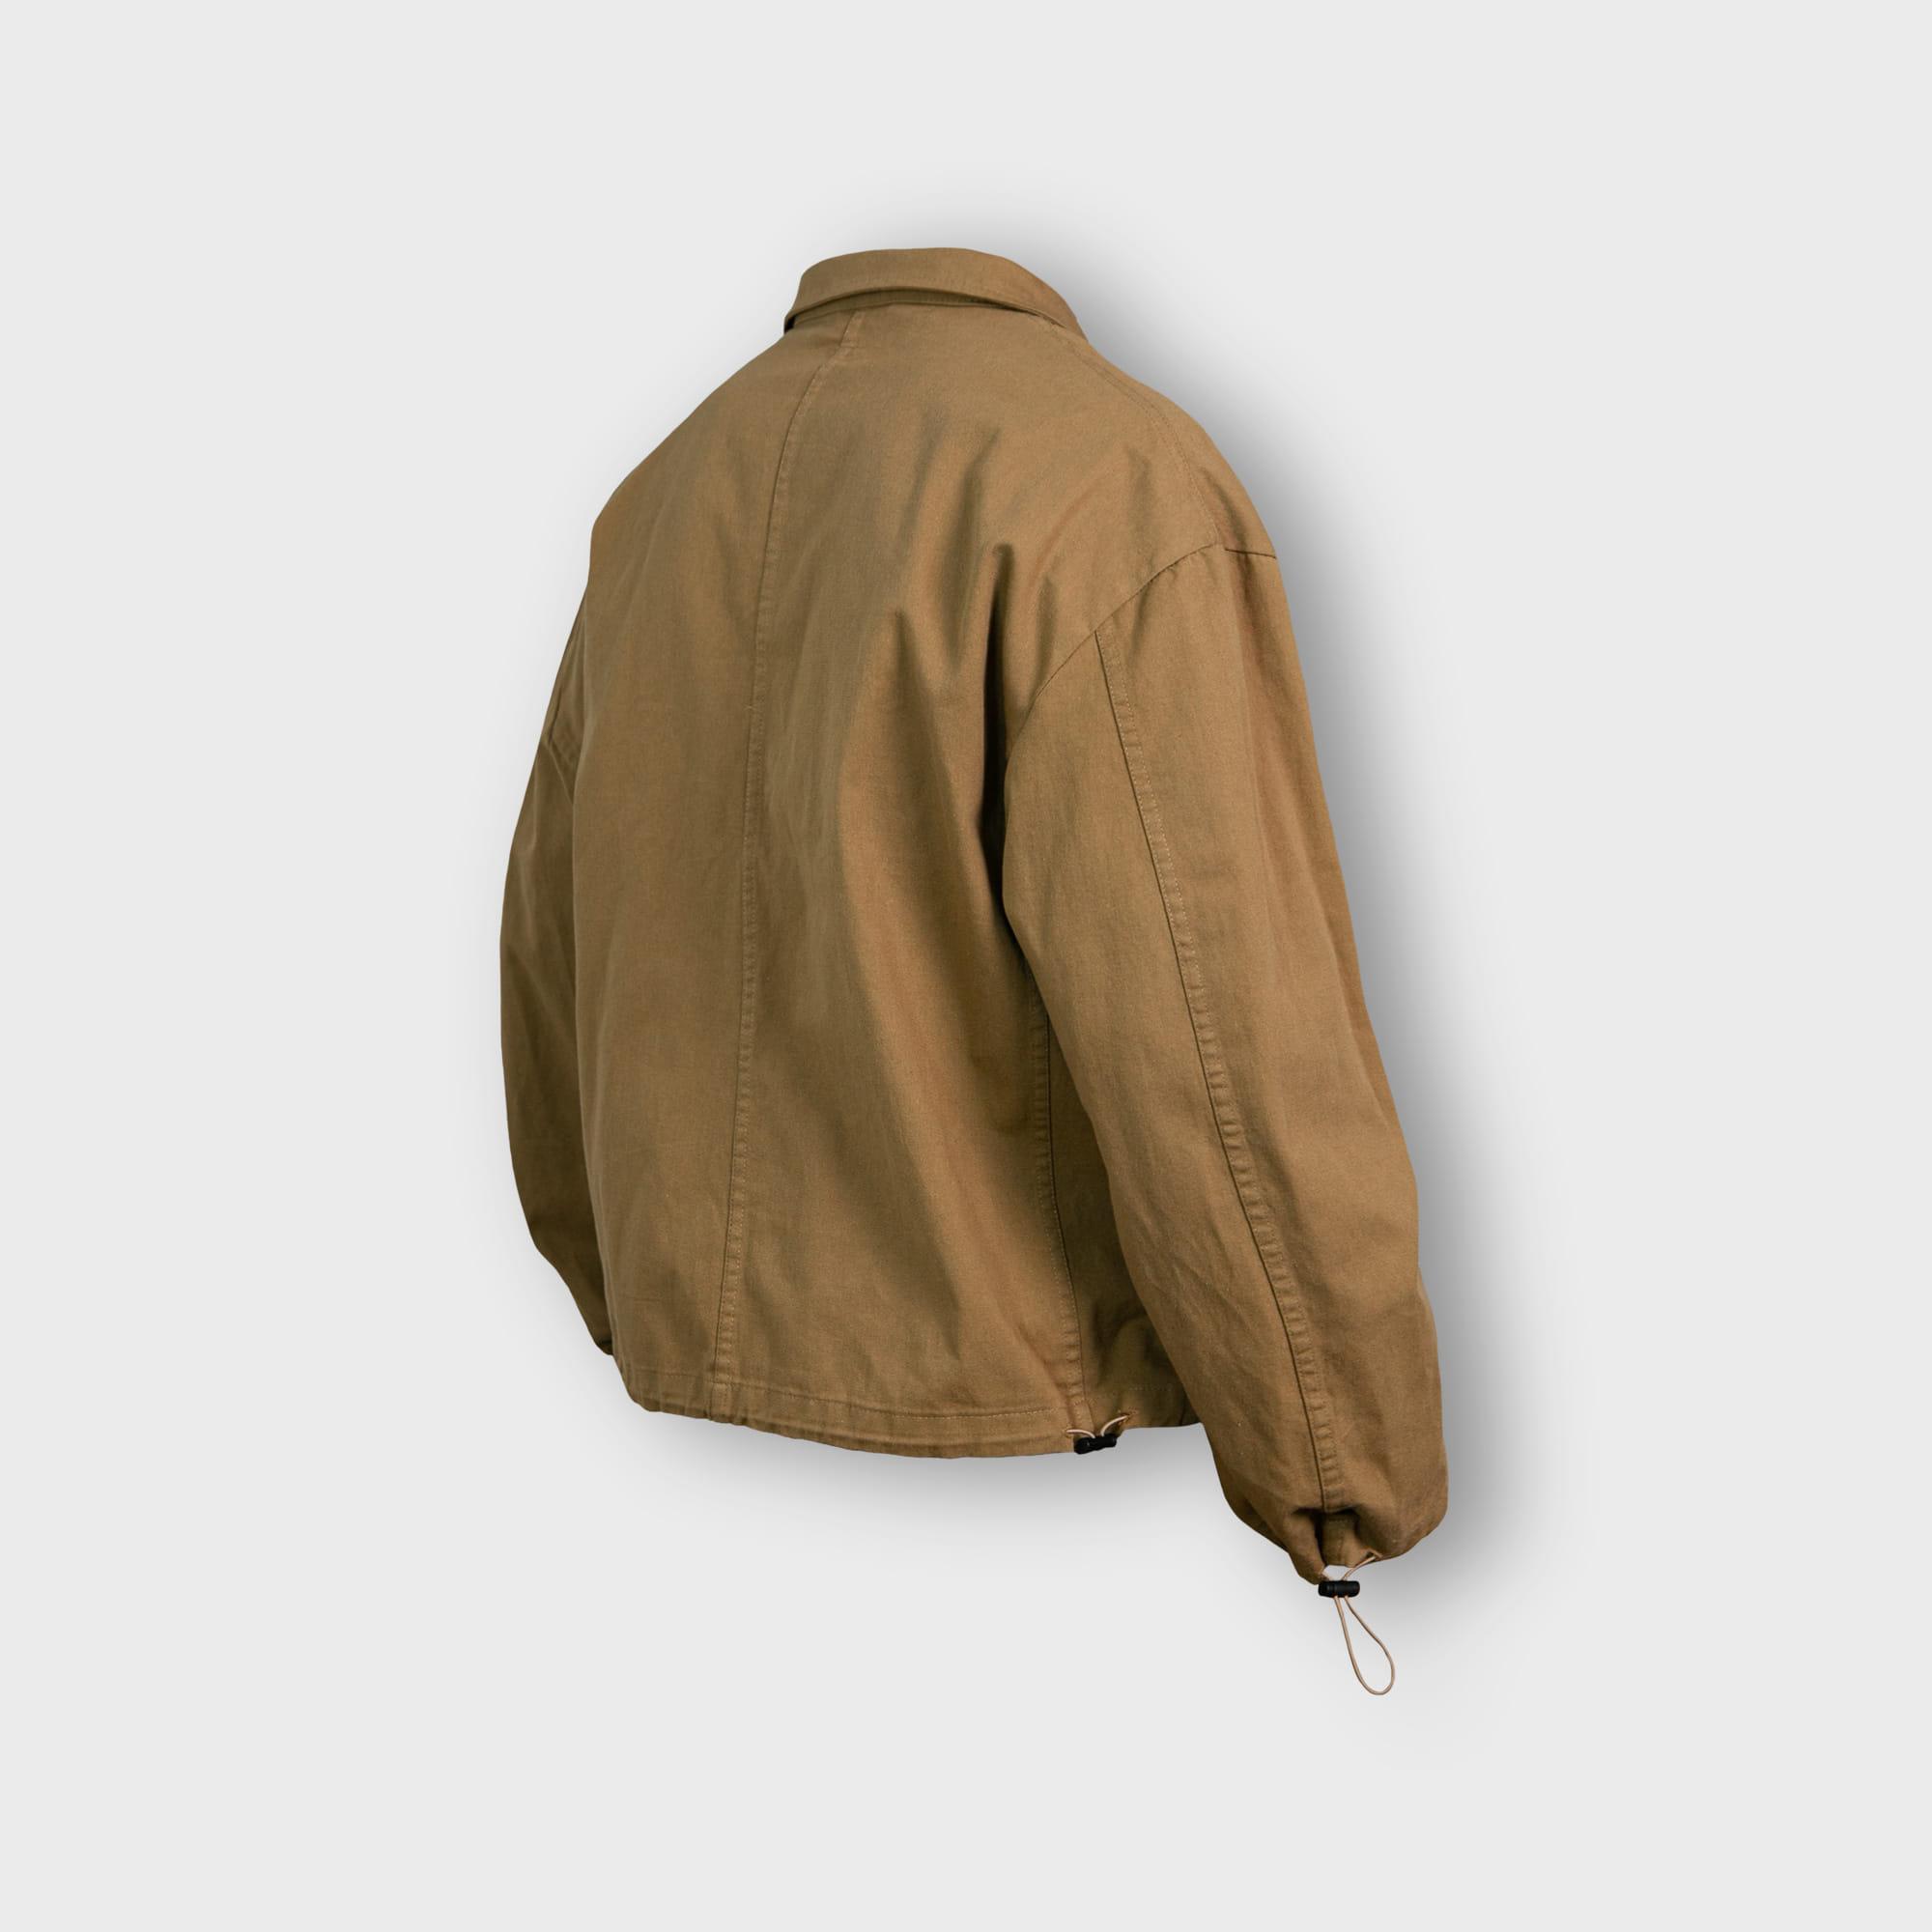 [AG] Twill Cotton String Shirt Jacket - Beige